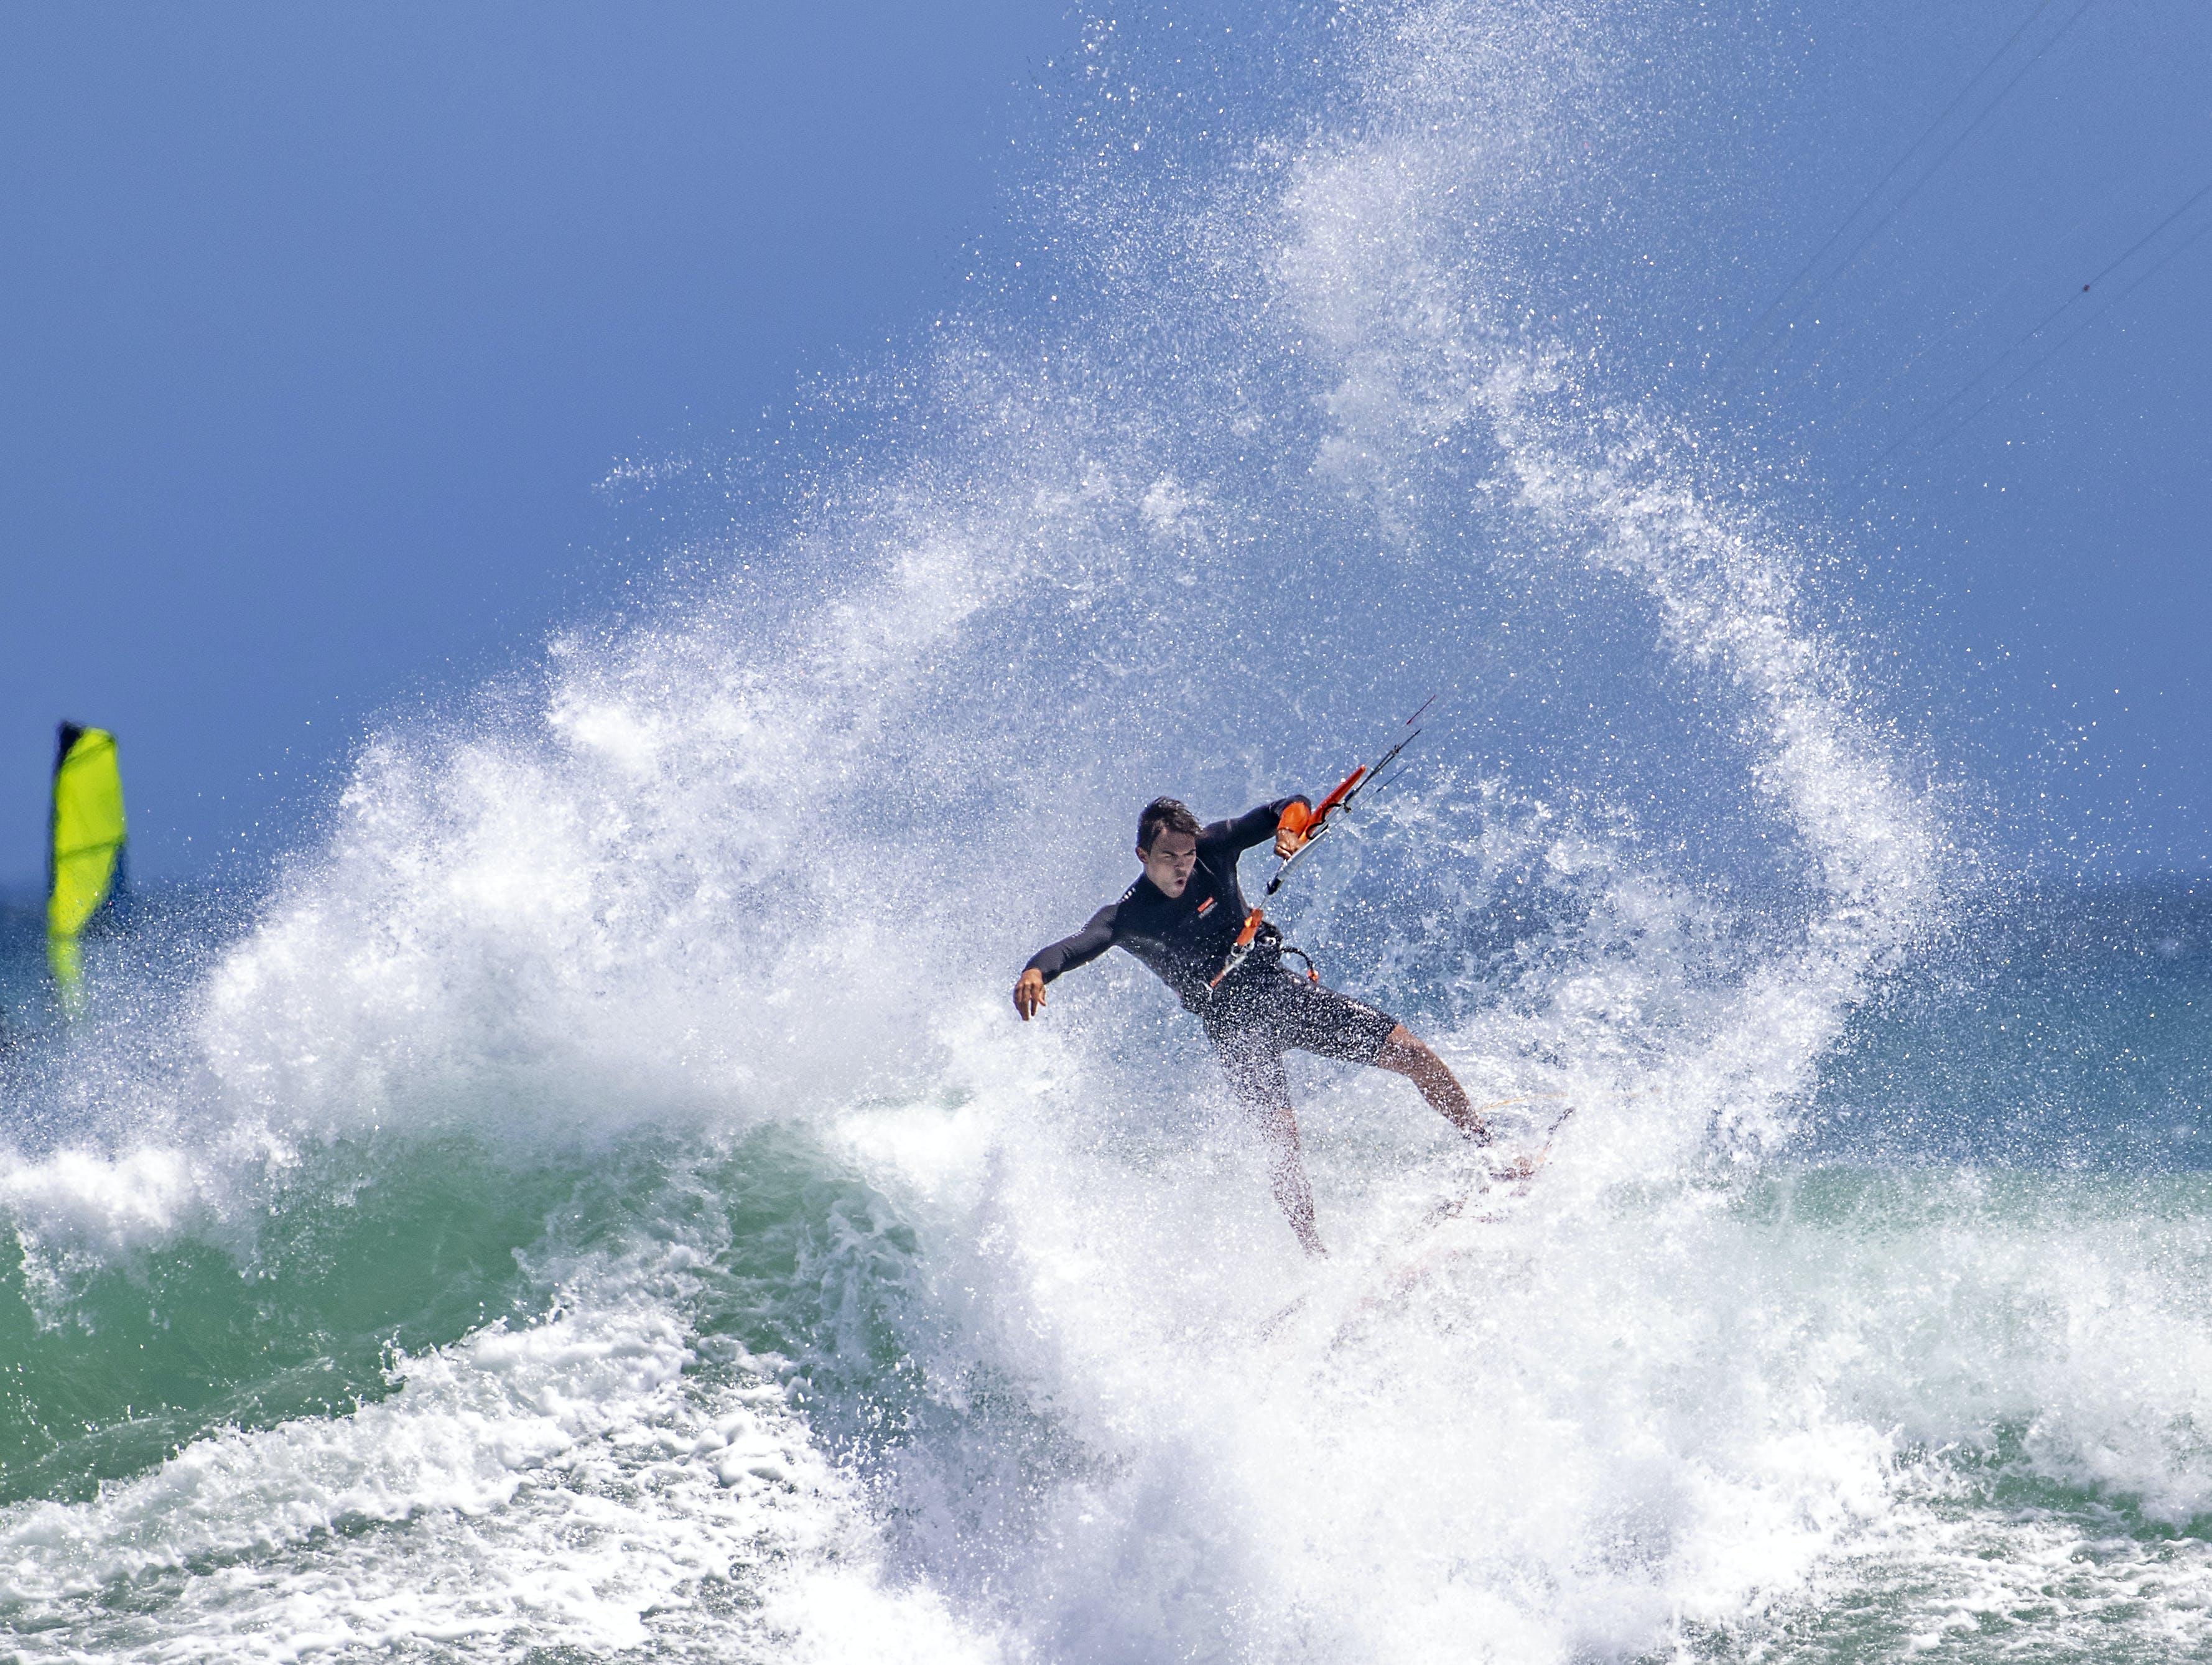 Man Water Skiing during Day